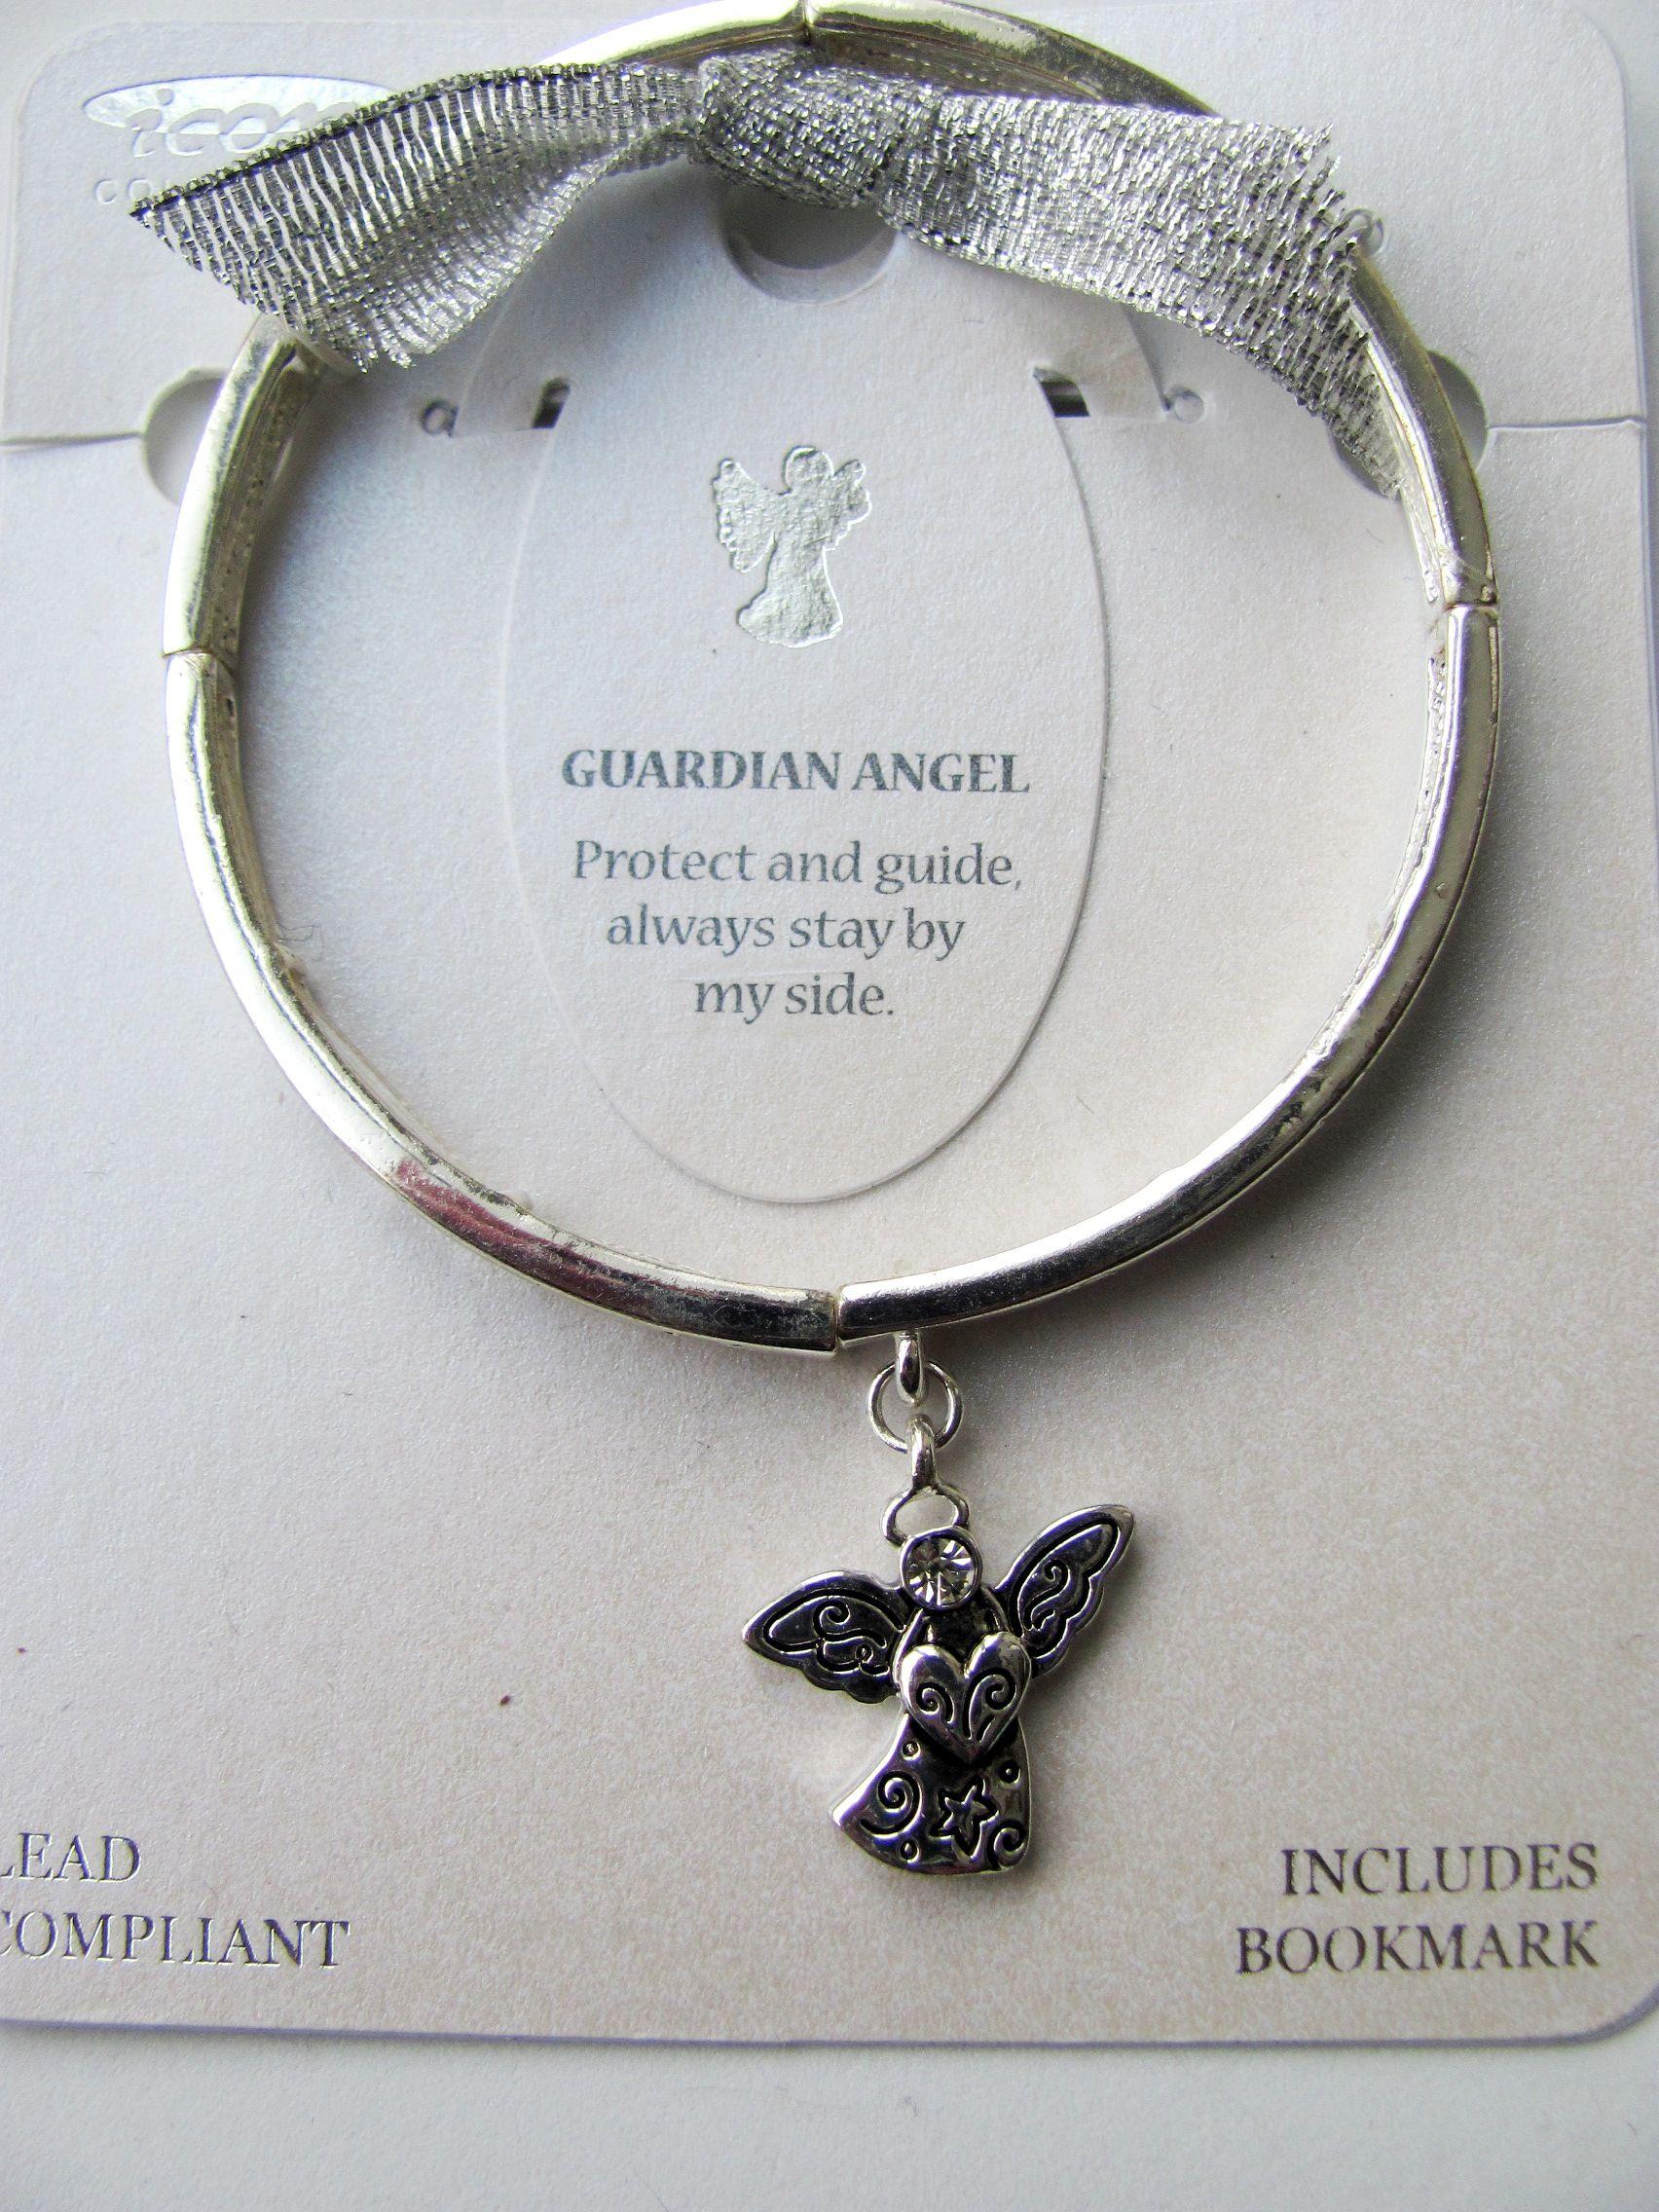 Guardian Angel Charm Inspirational Message Bracelet Silver